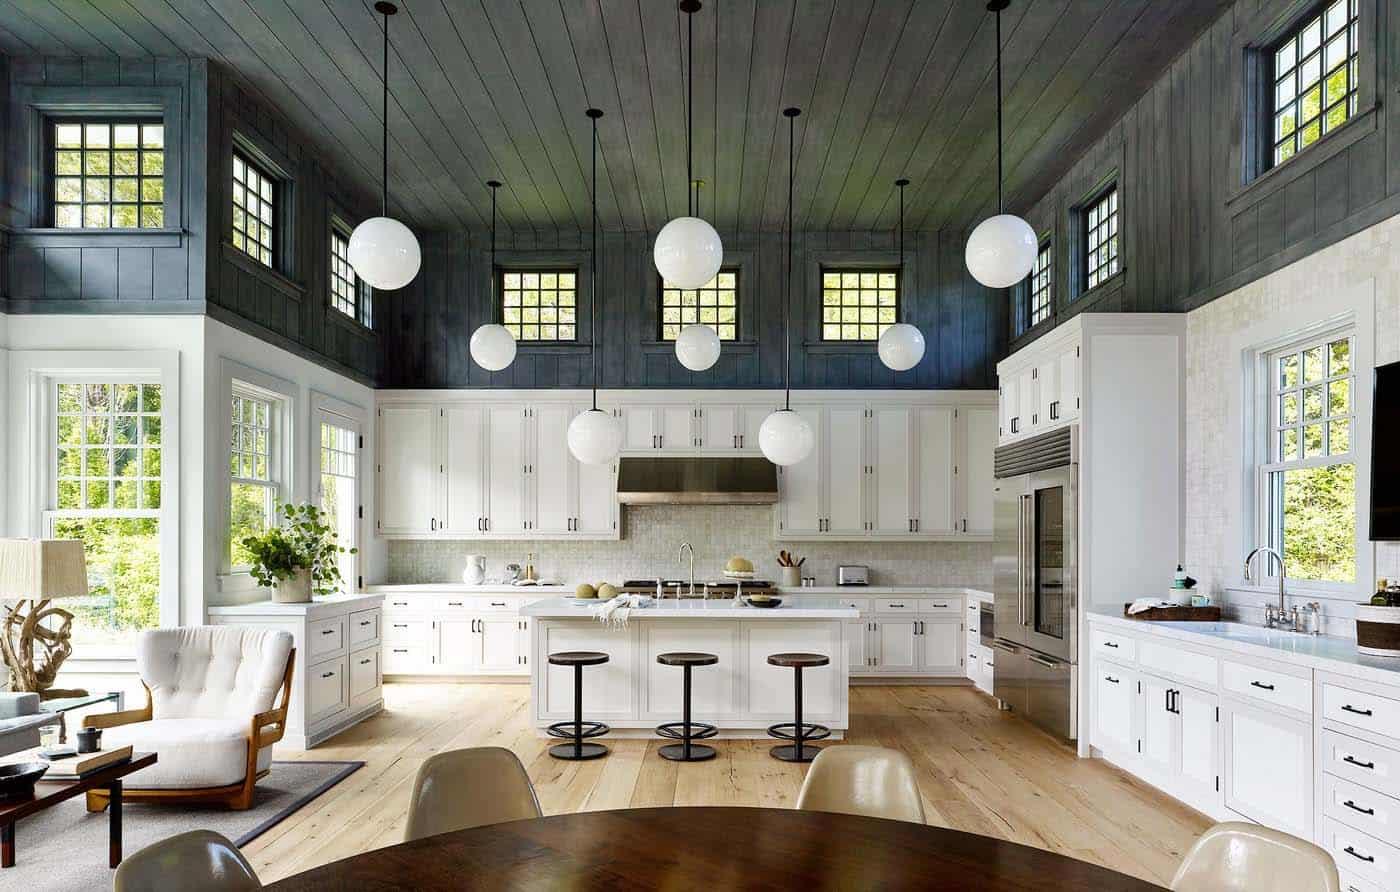 Modern Shingle-Style Home-Dan Scotti Design-03-1 Kindesign